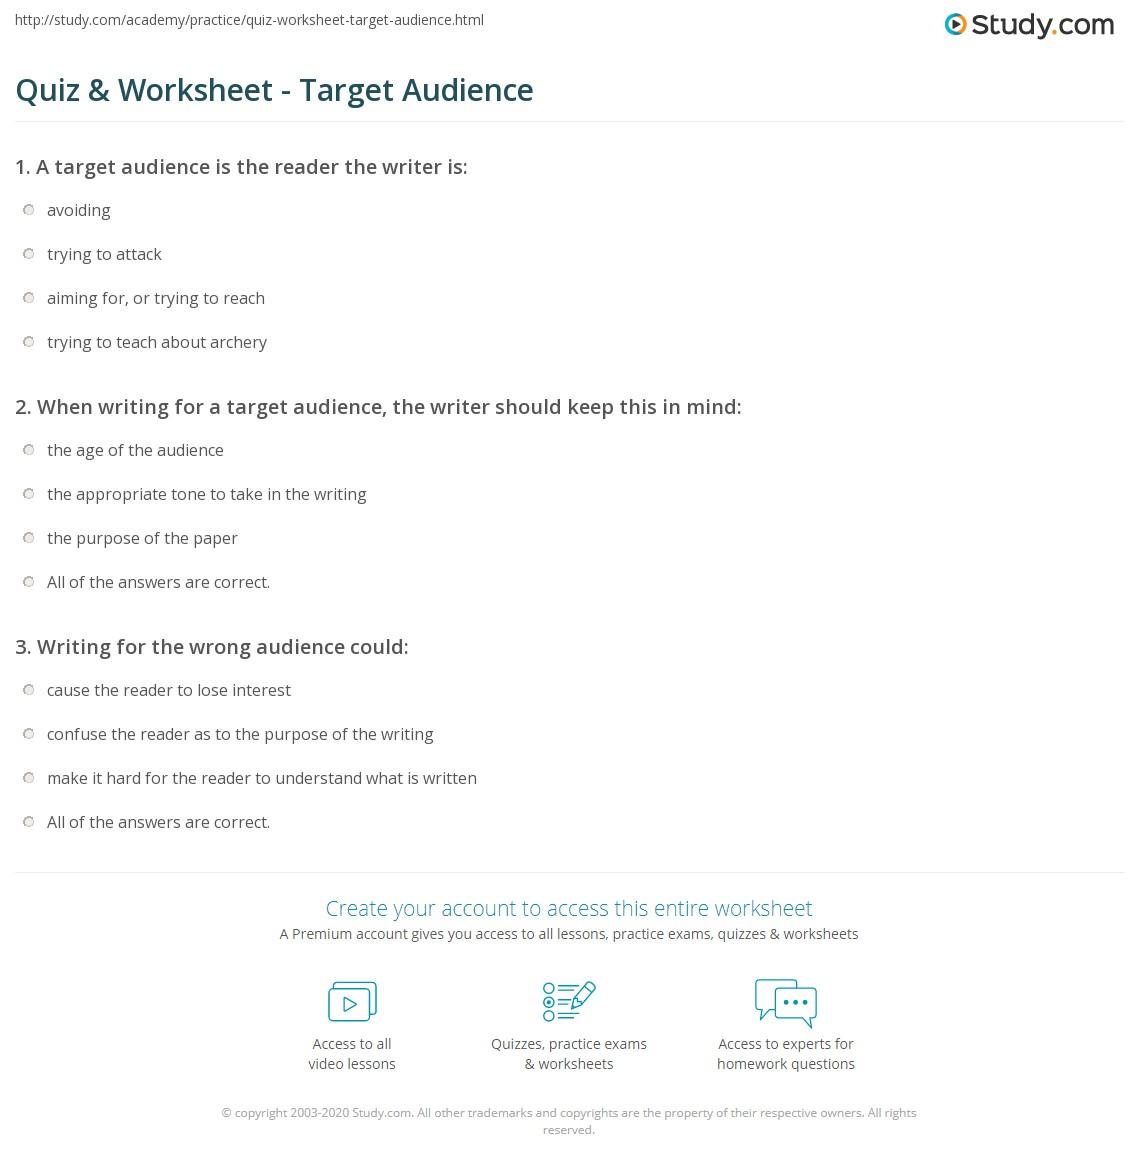 Quiz & Worksheet - Target Audience   Study.com